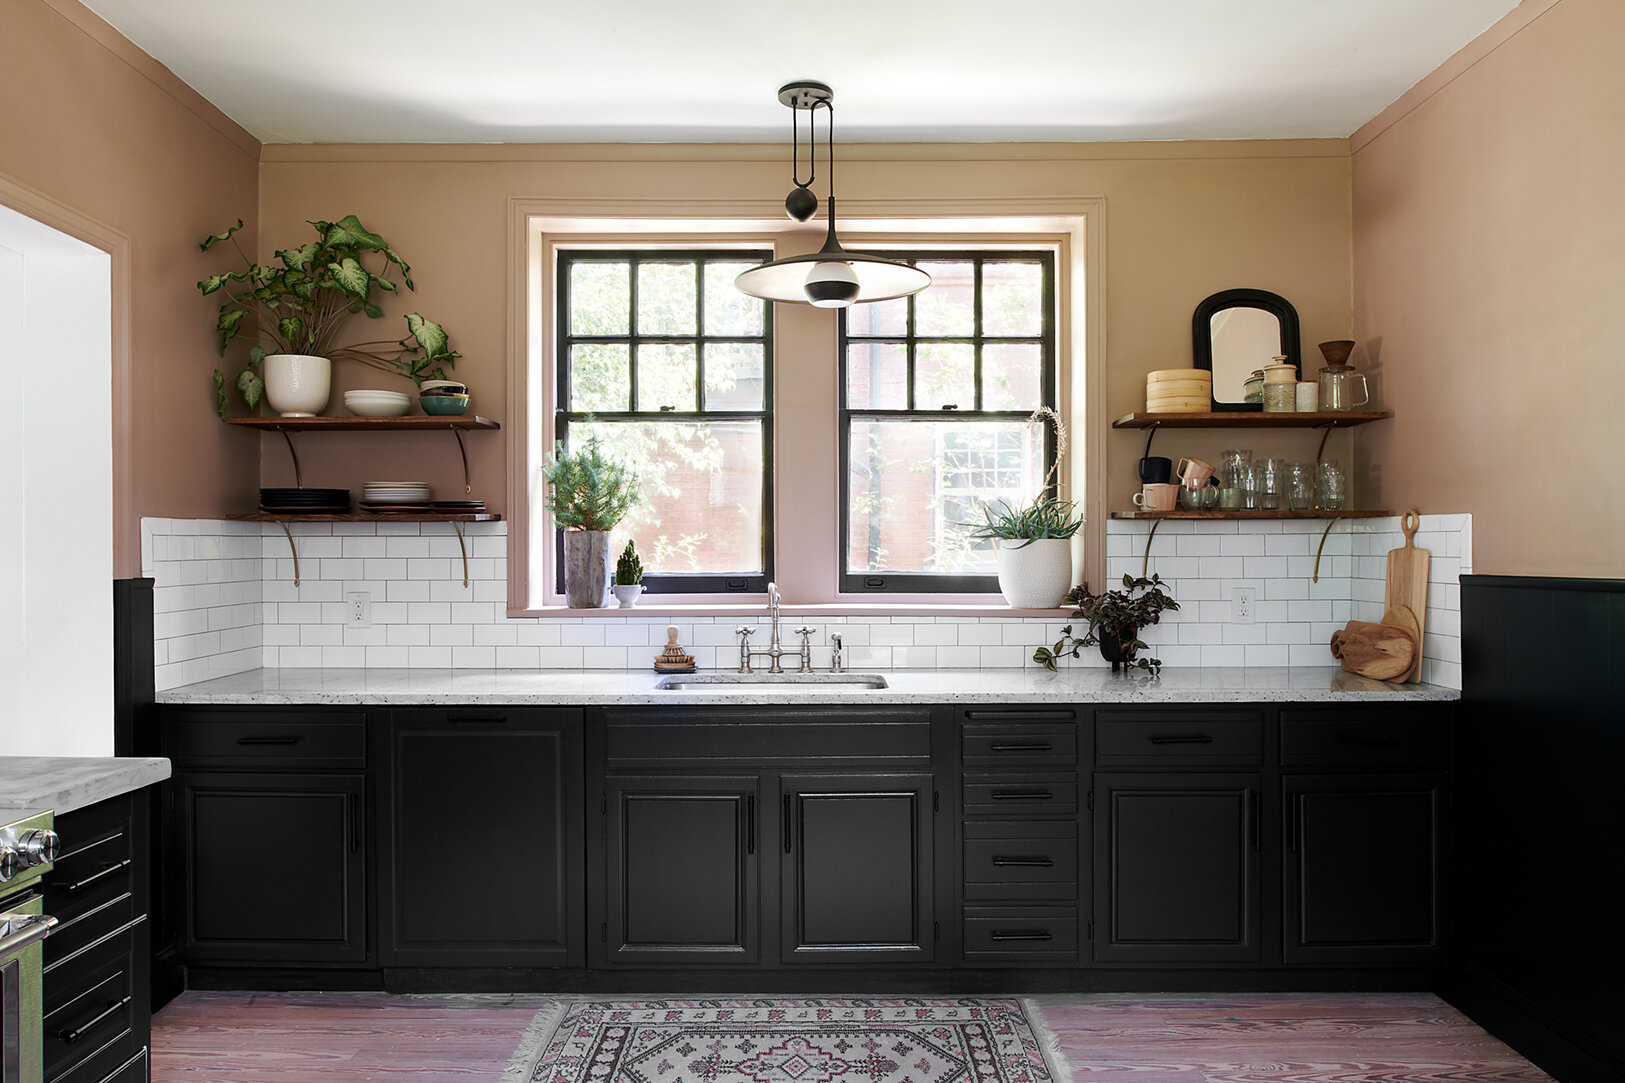 kitchen_lowres_window wall_01_v2.jpg